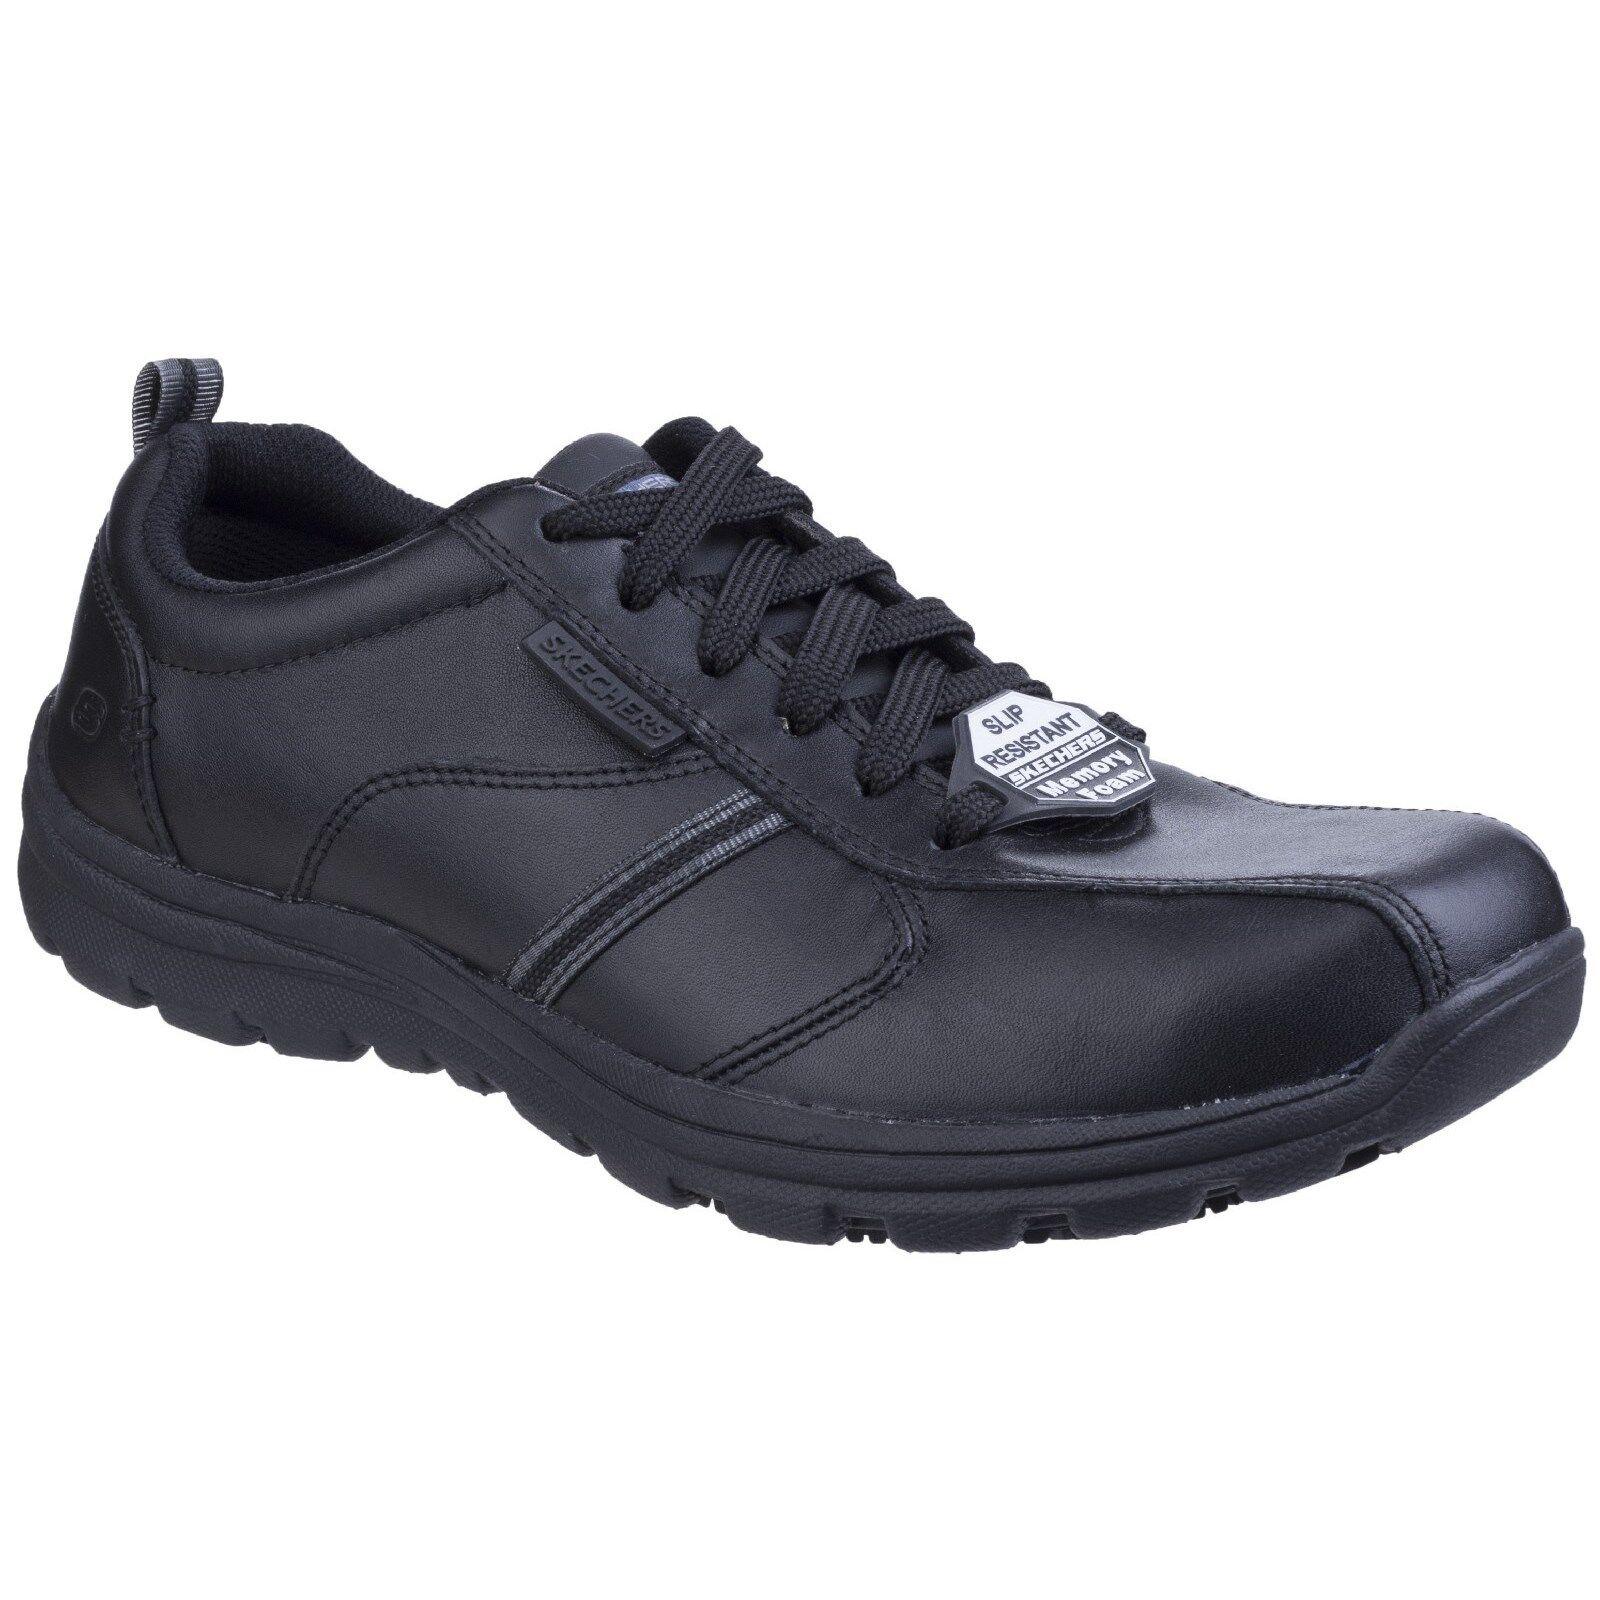 Skechers Hobbes confraternita LAVORO SCARPE MEMORY FOAM Pelle antiscivolo Sneaker Uomo In Pelle FOAM b2b675